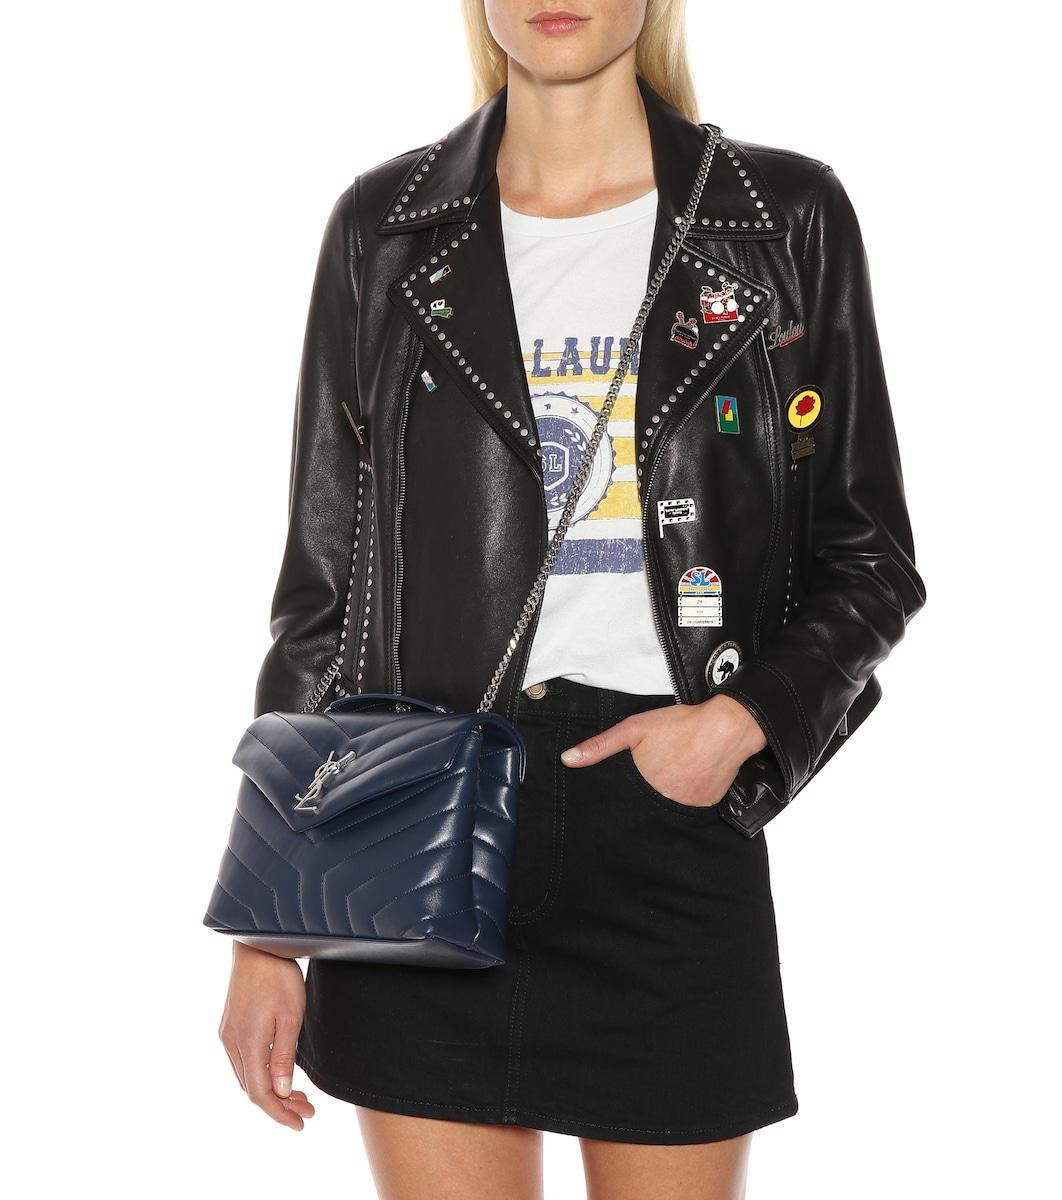 a0e2ce24a3 Small Loulou Leather Shoulder Bag - Saint Laurent | mytheresa